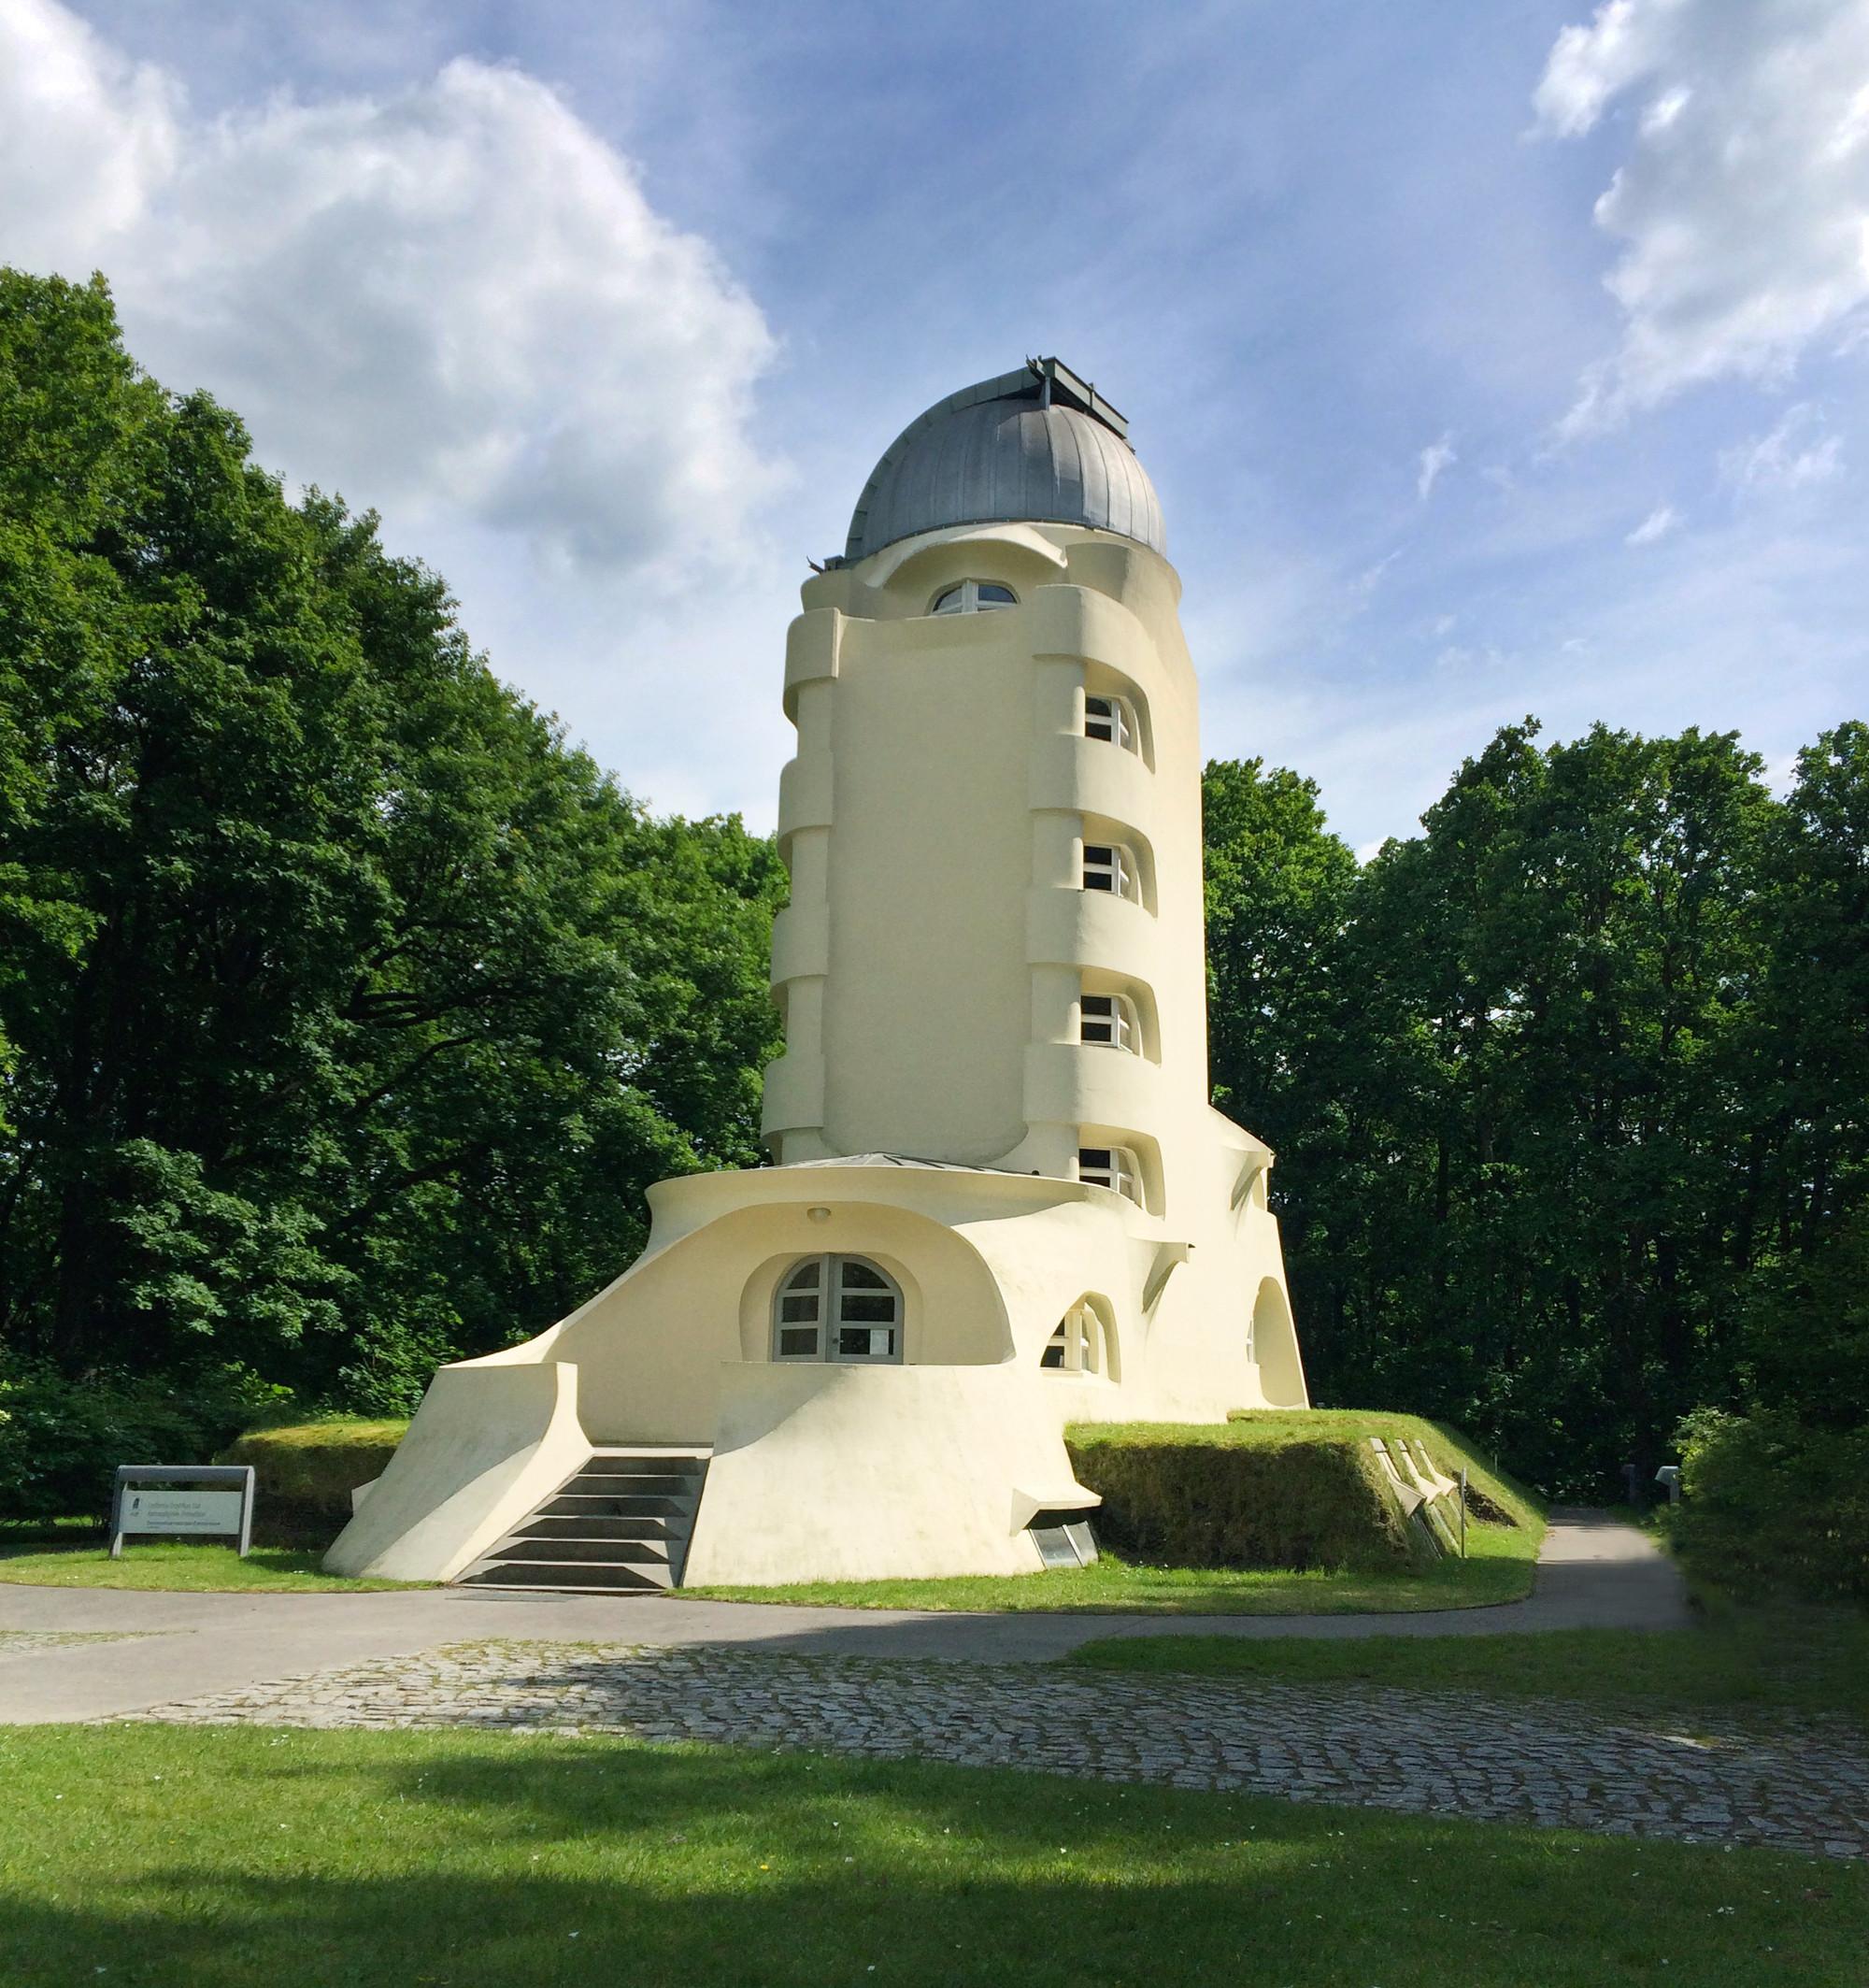 AD Classics: The Einstein Tower / Erich Mendelsohn, © Gili Merin